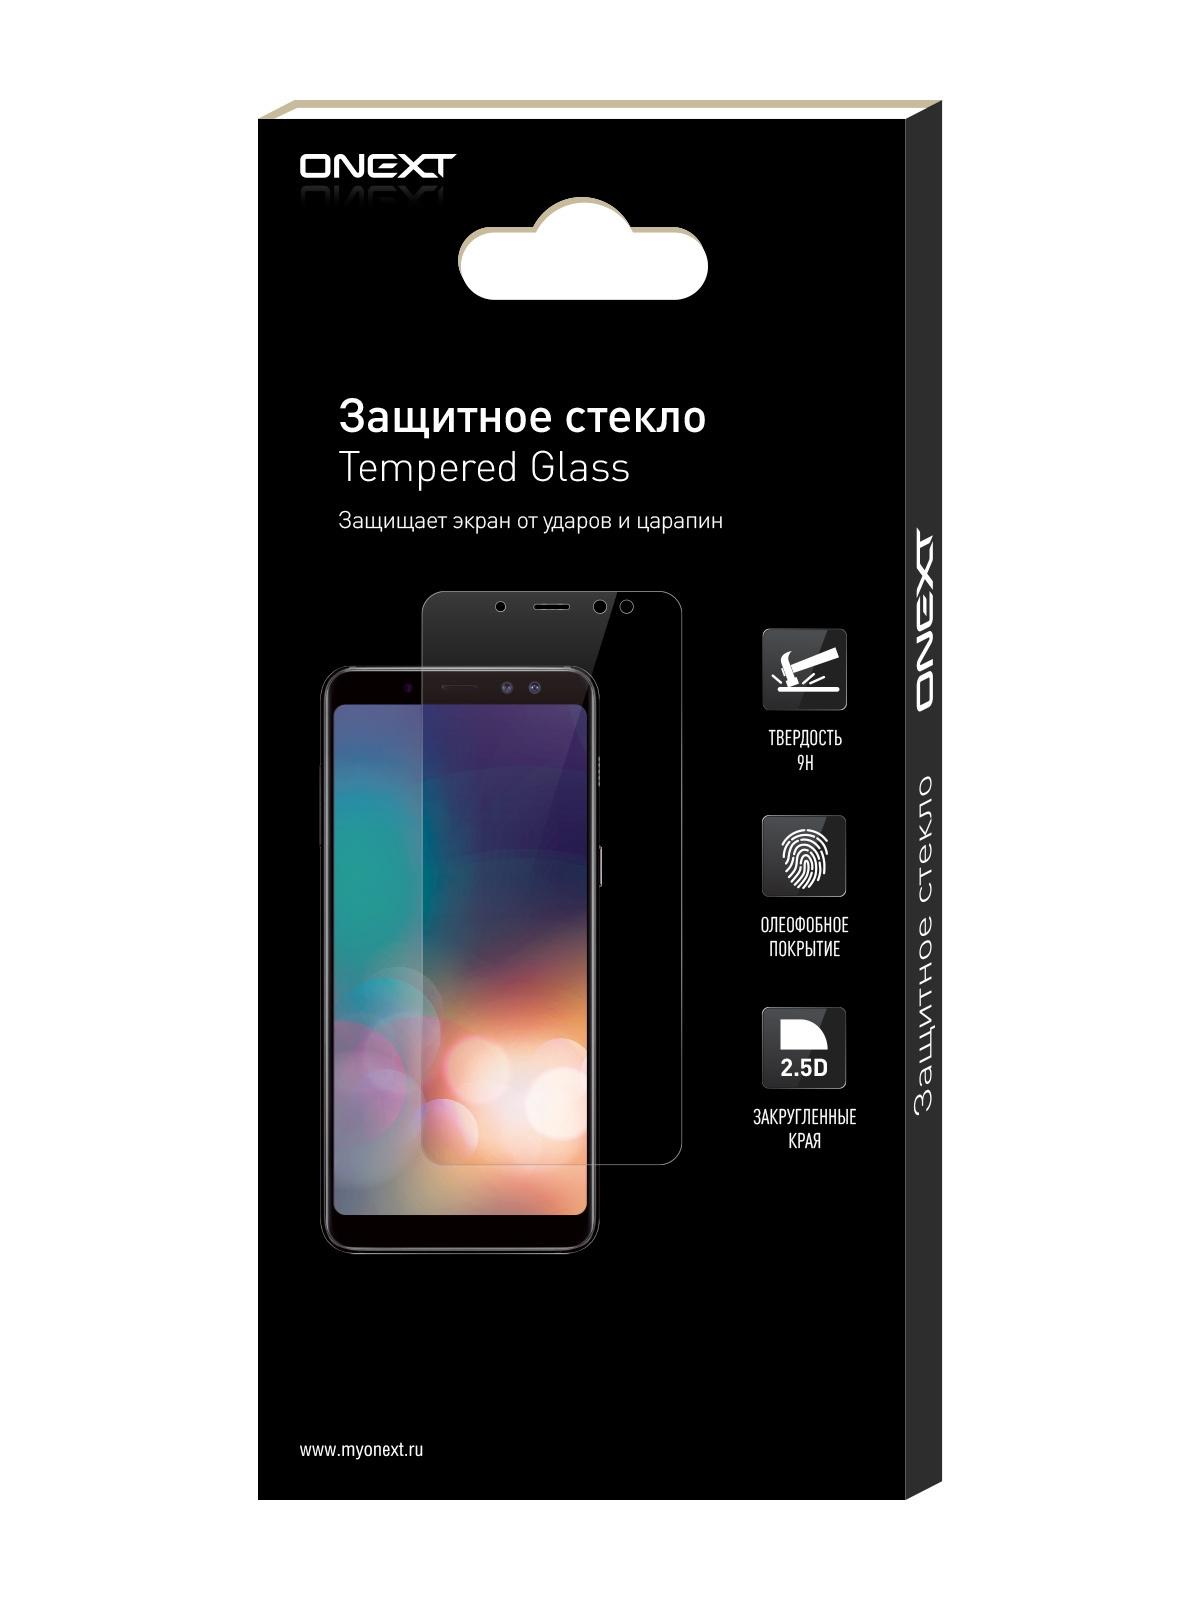 Защитное стекло ONEXT HTC U Play поворот экрана htc